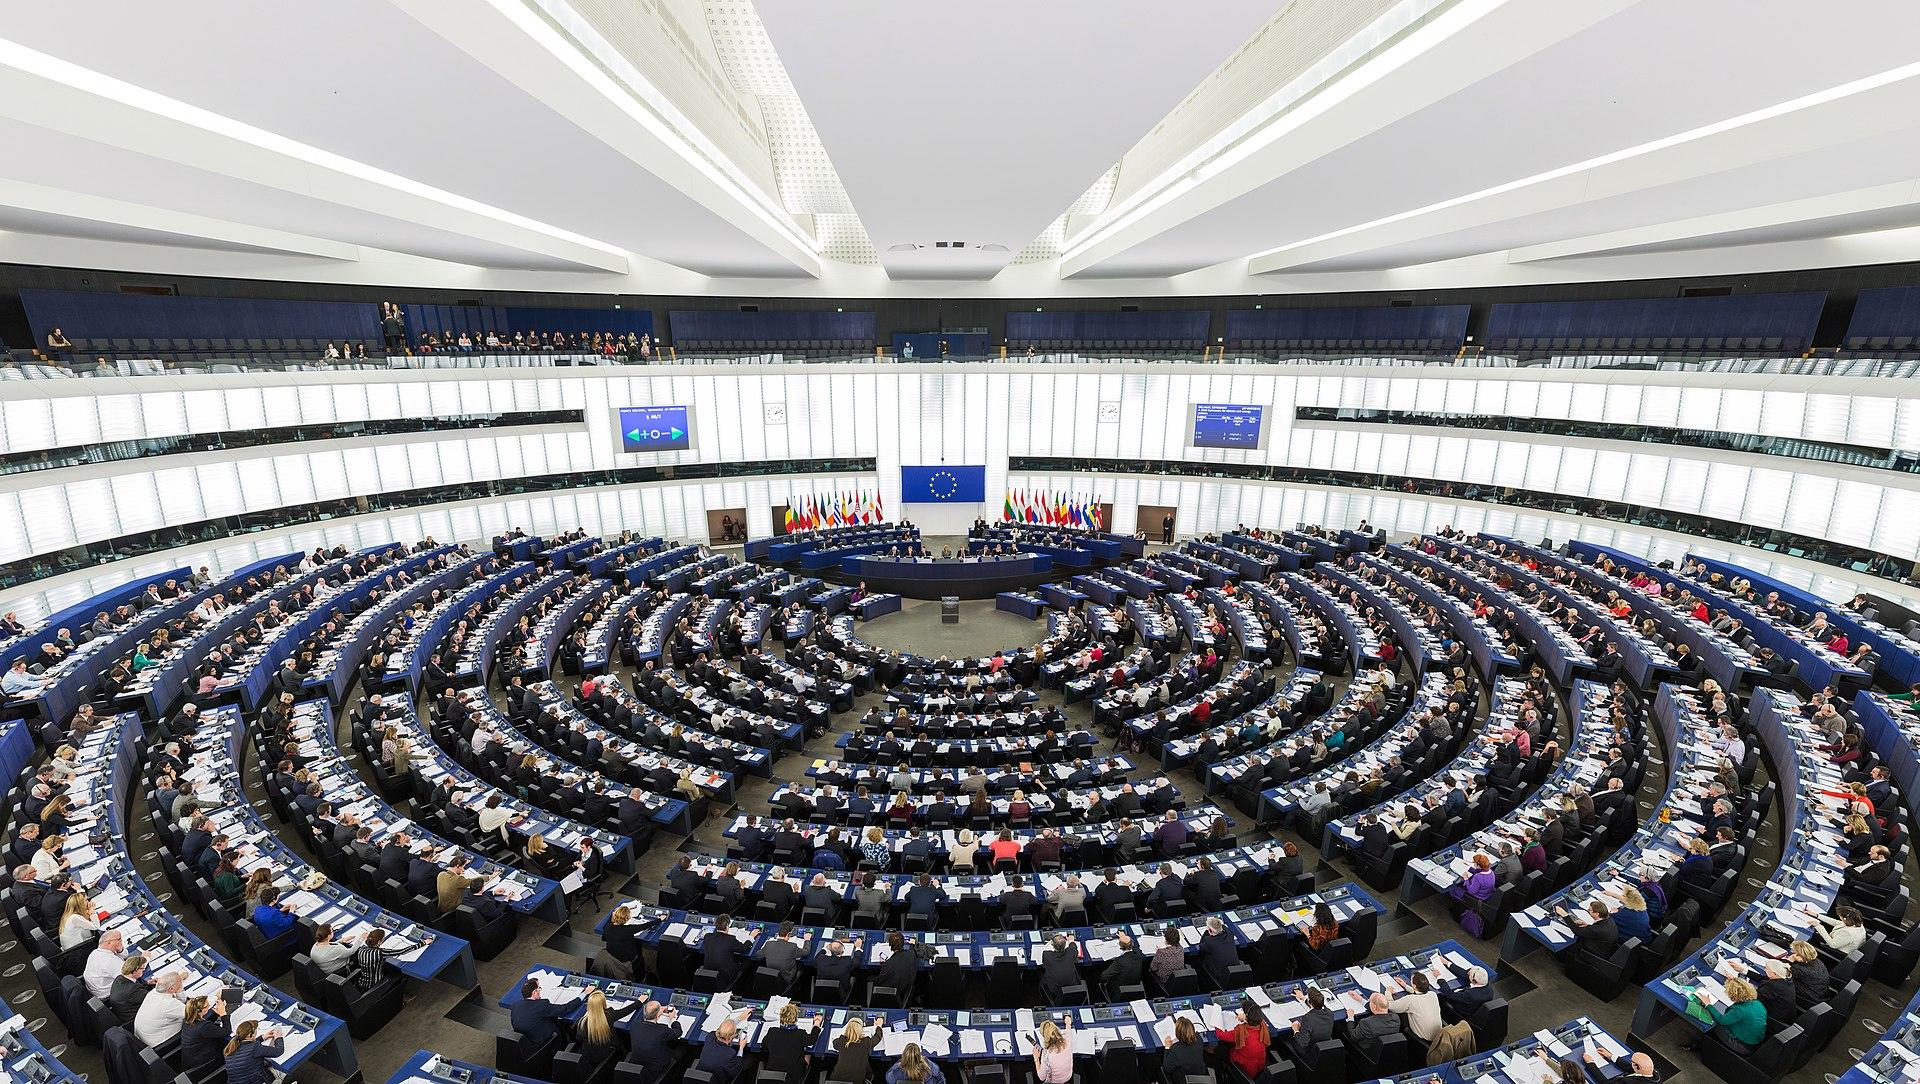 European Parliament Strasbourg Hemicycle - Diliff.jpg